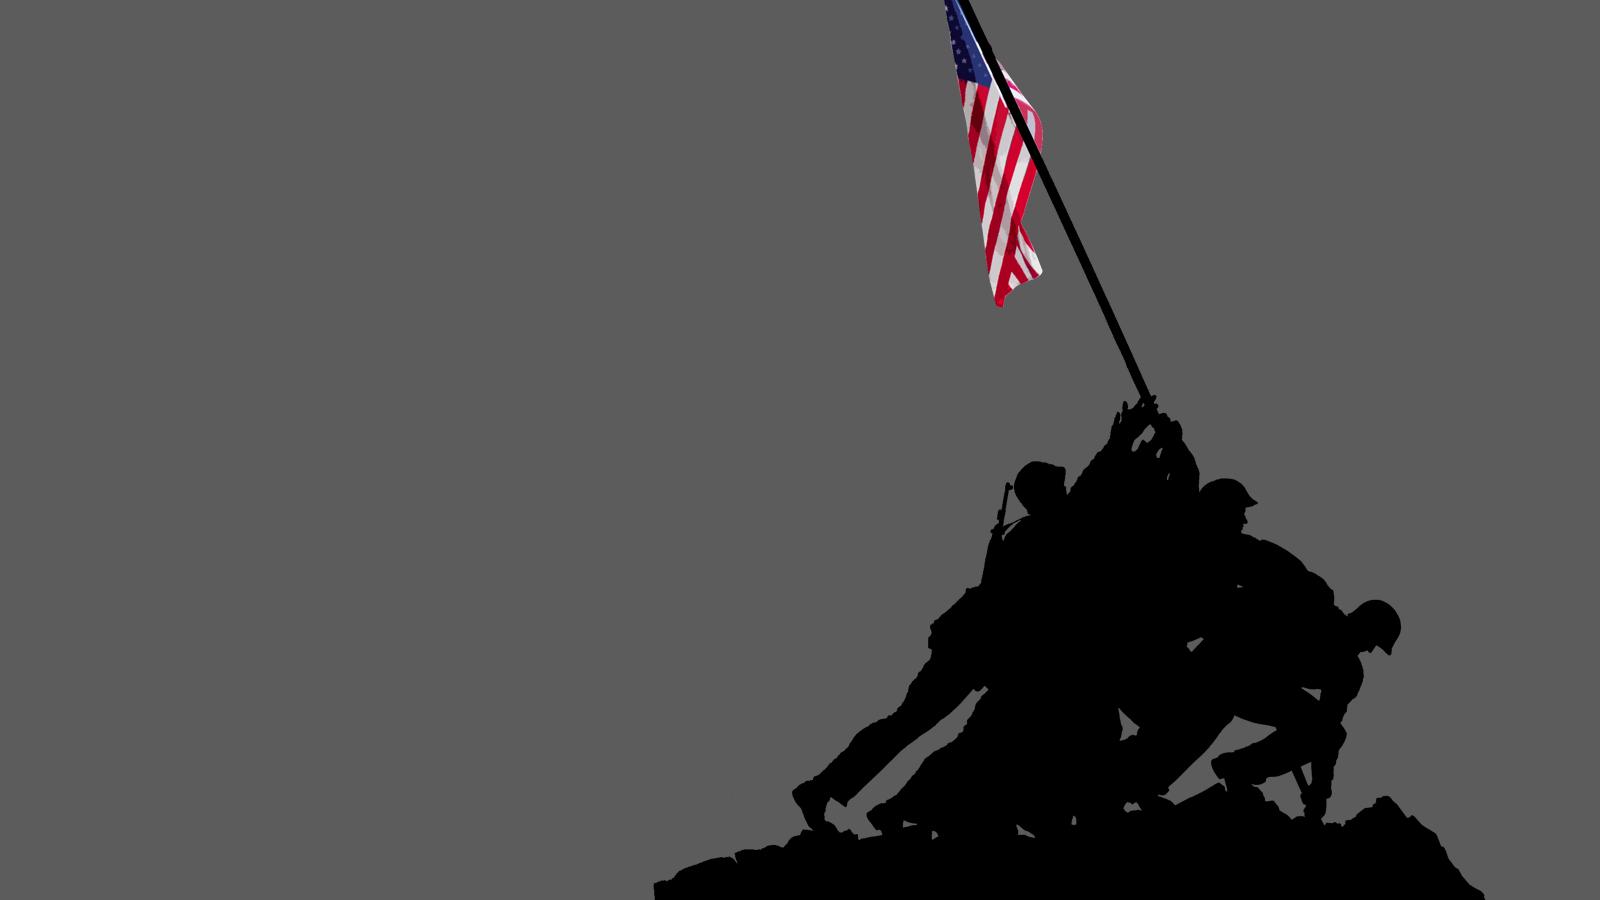 Wallpaper 1600x1200 Marine Flags USMC